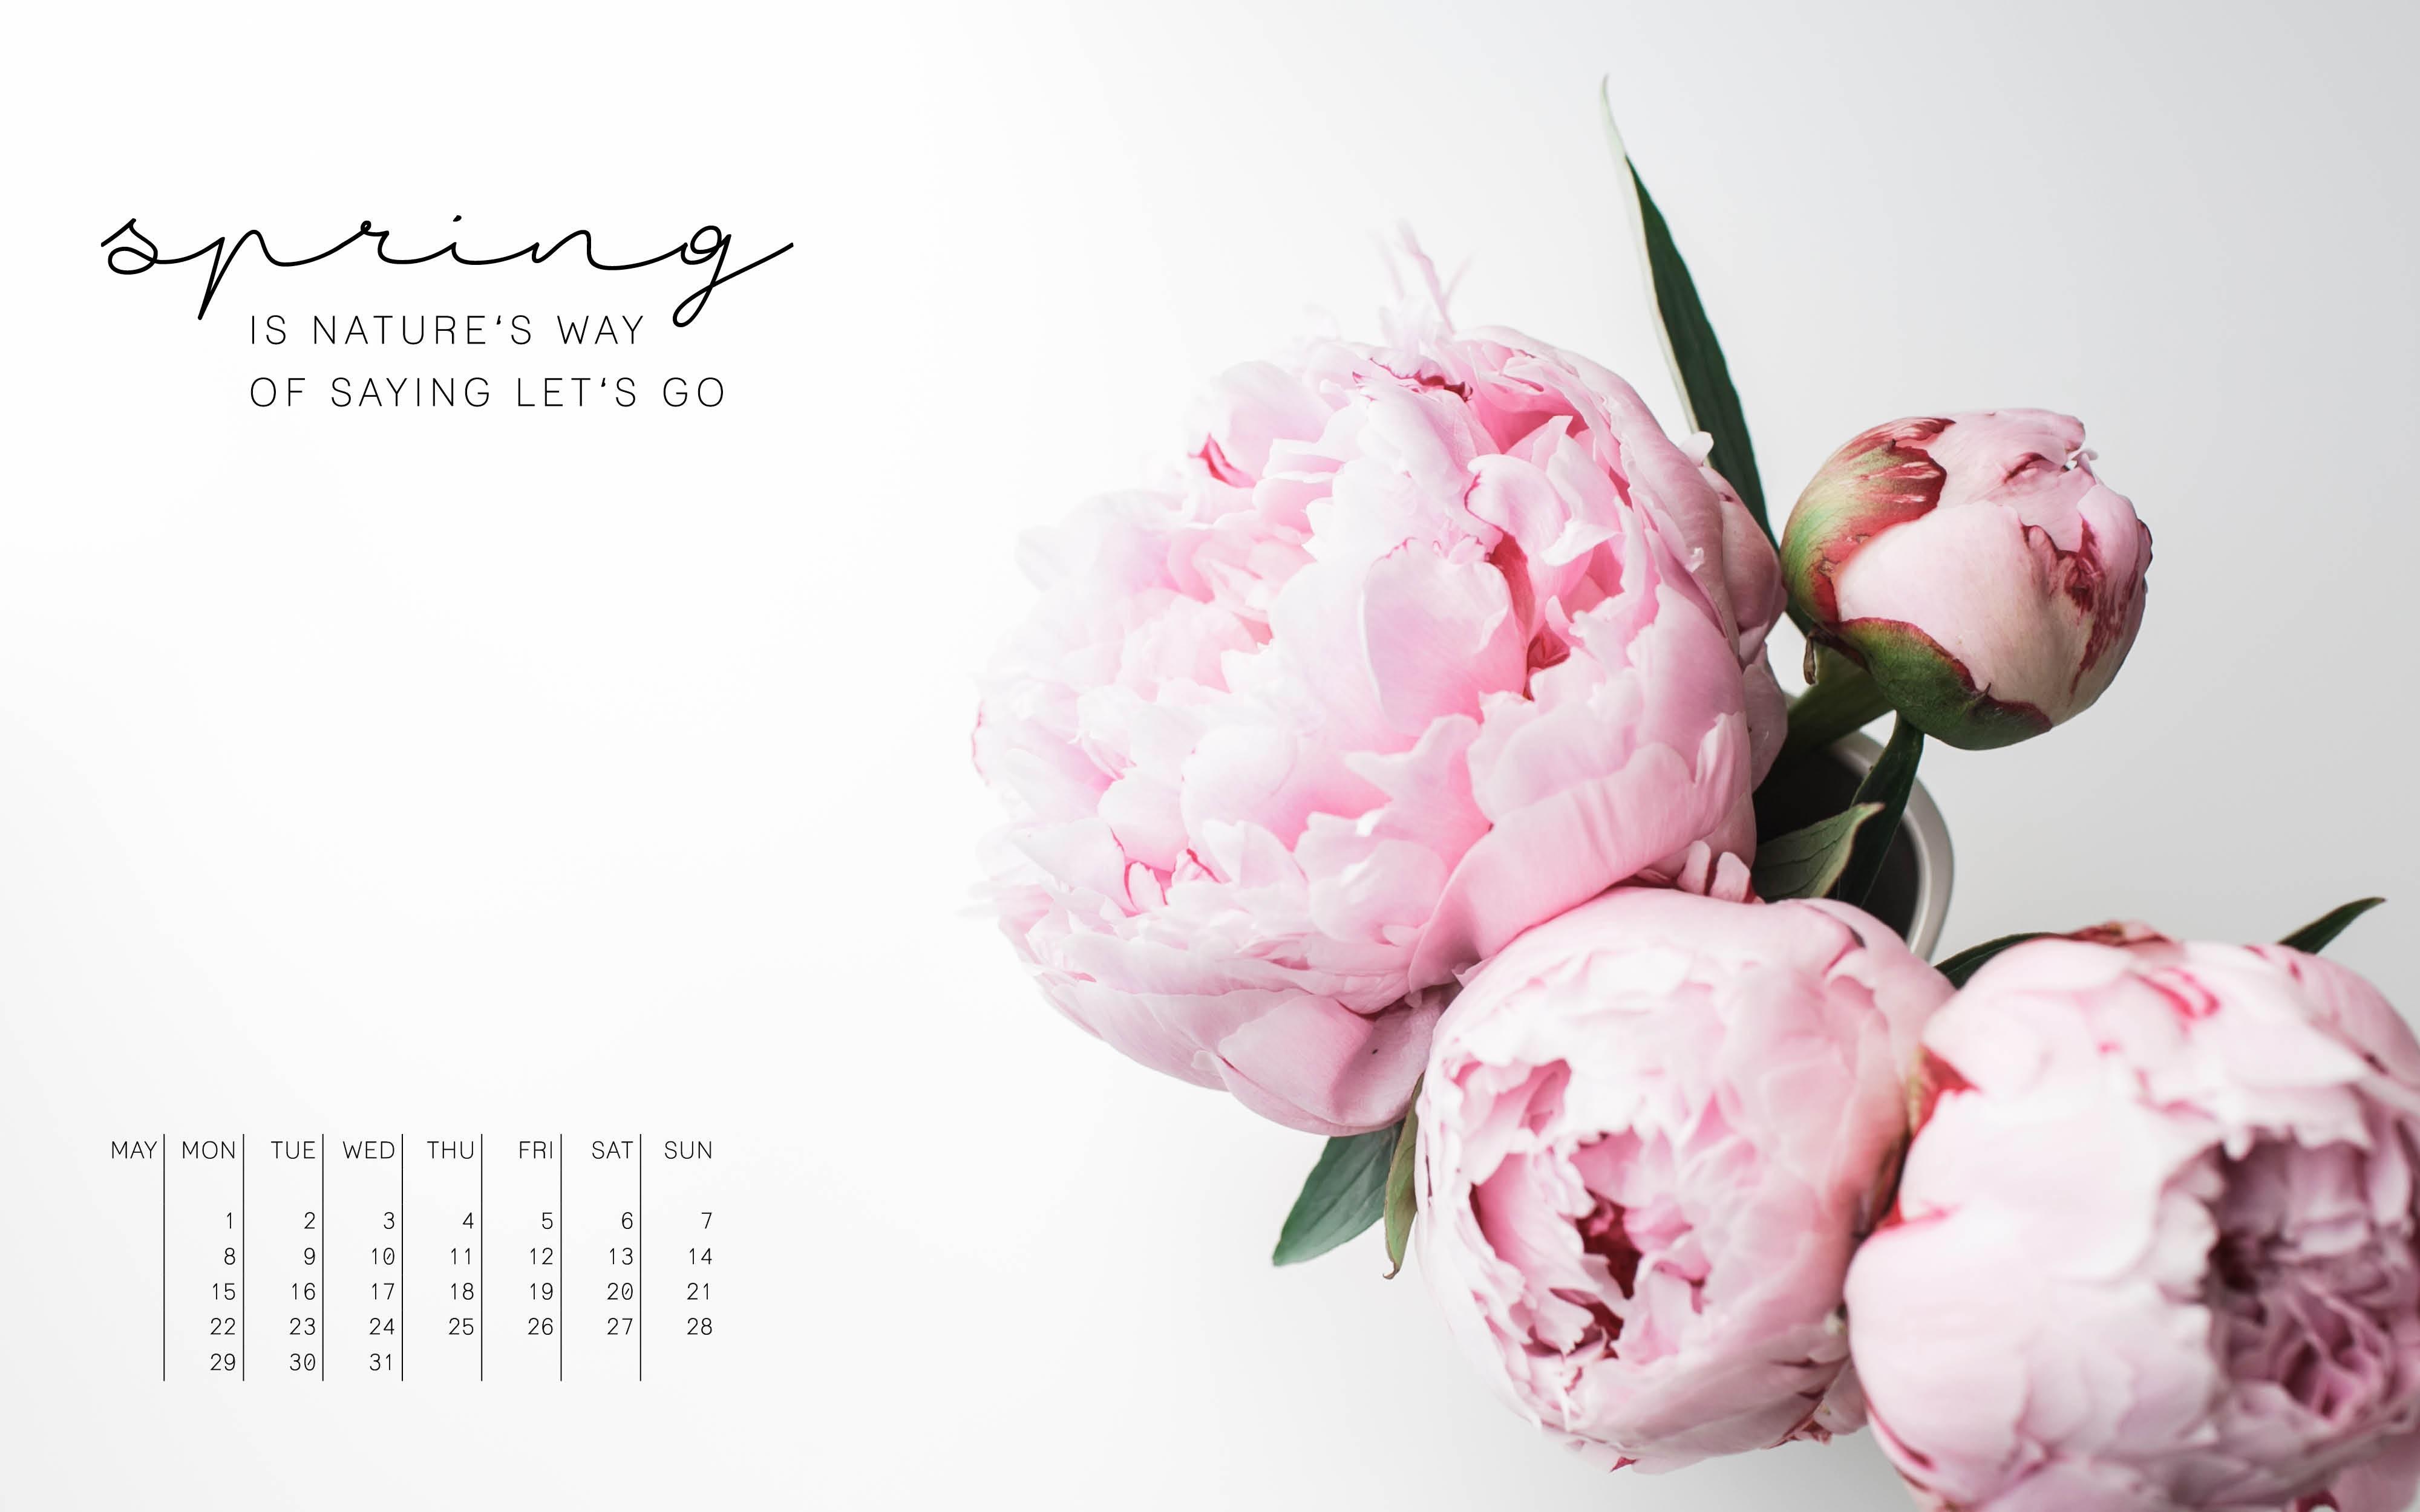 March 6 Calendar Más Arriba-a-fecha Kostenlose Wallpaper Entdecke Jeden Monat Neue Motive Of March 6 Calendar Actual March 24 2019 Calendar